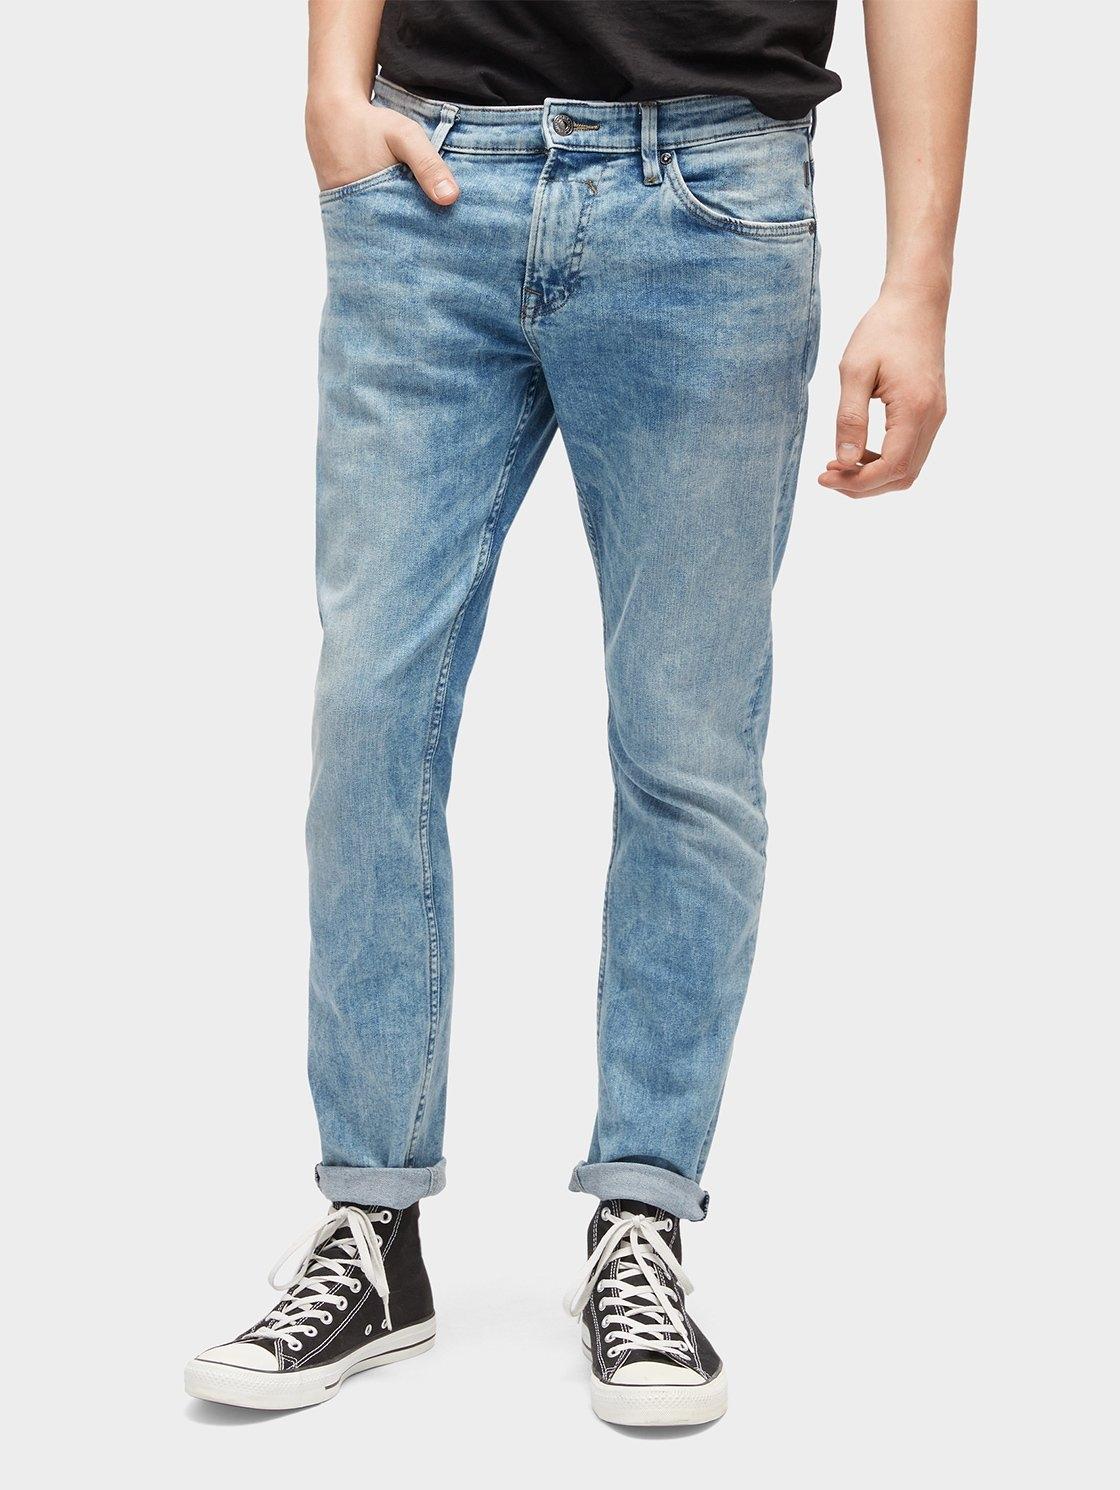 Afbeeldingsbron  Tom Tailor Denim slim fit jeans »Piers Super Slim jeans« a4fa871590